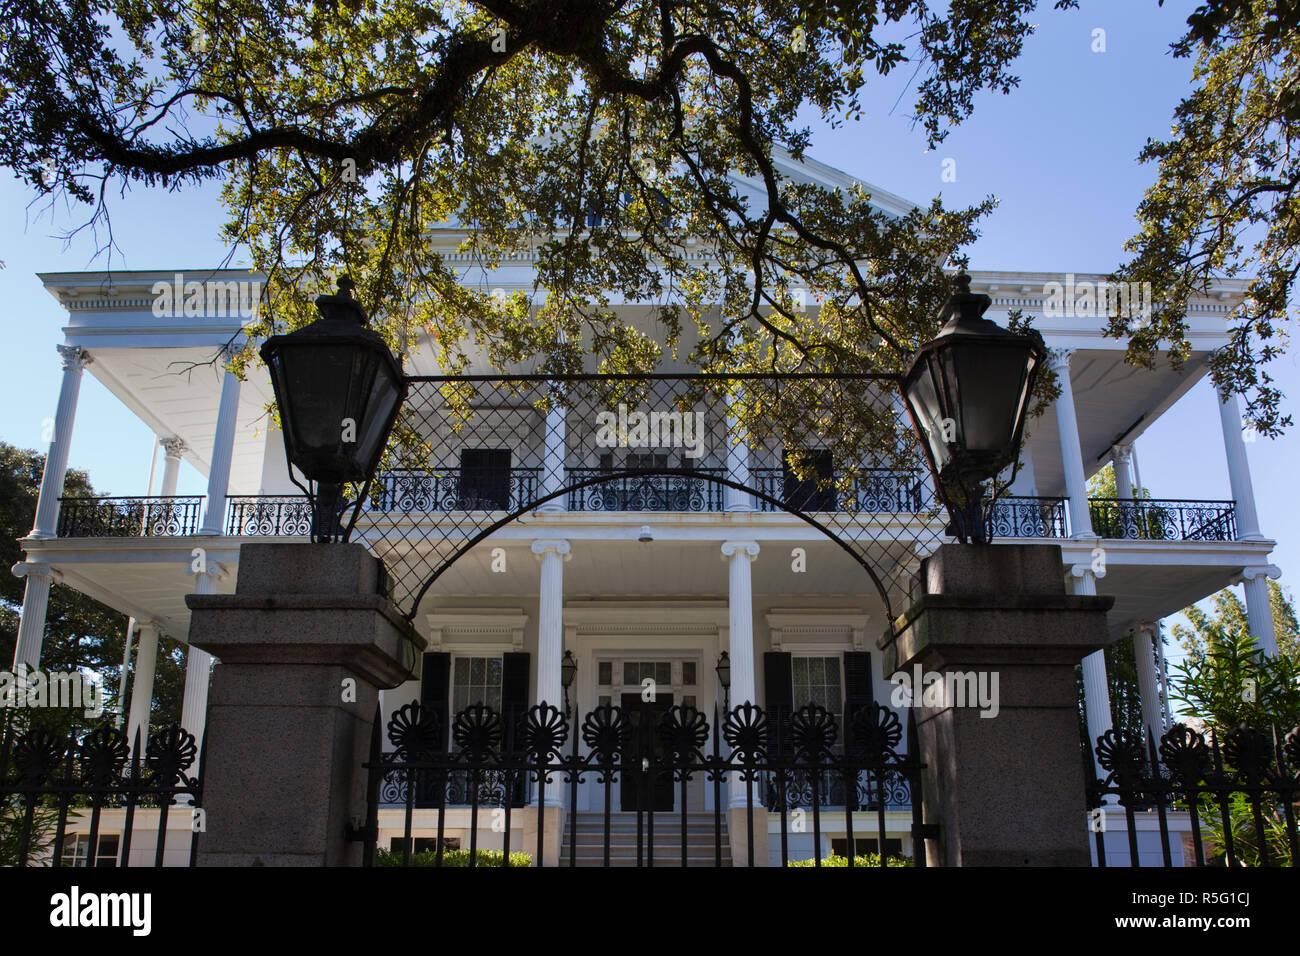 USA, Louisiana, New Orleans, Garden District, Buckner House, Garden District Mansion - Stock Image